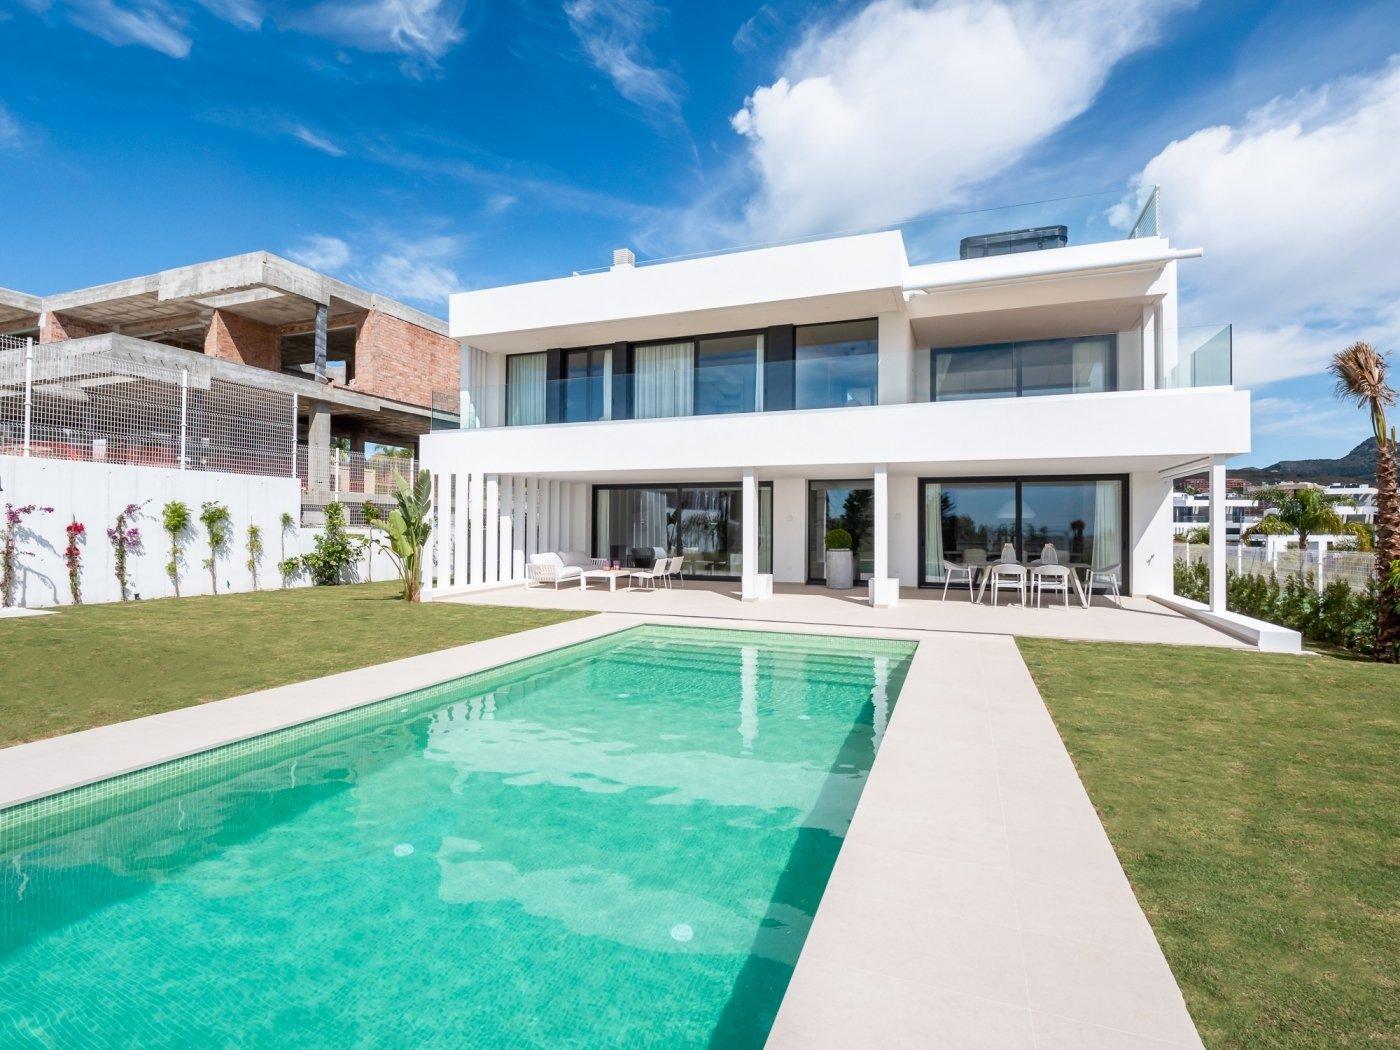 Villa in Cancelada, Andalusia, Spain 1 - 11294181